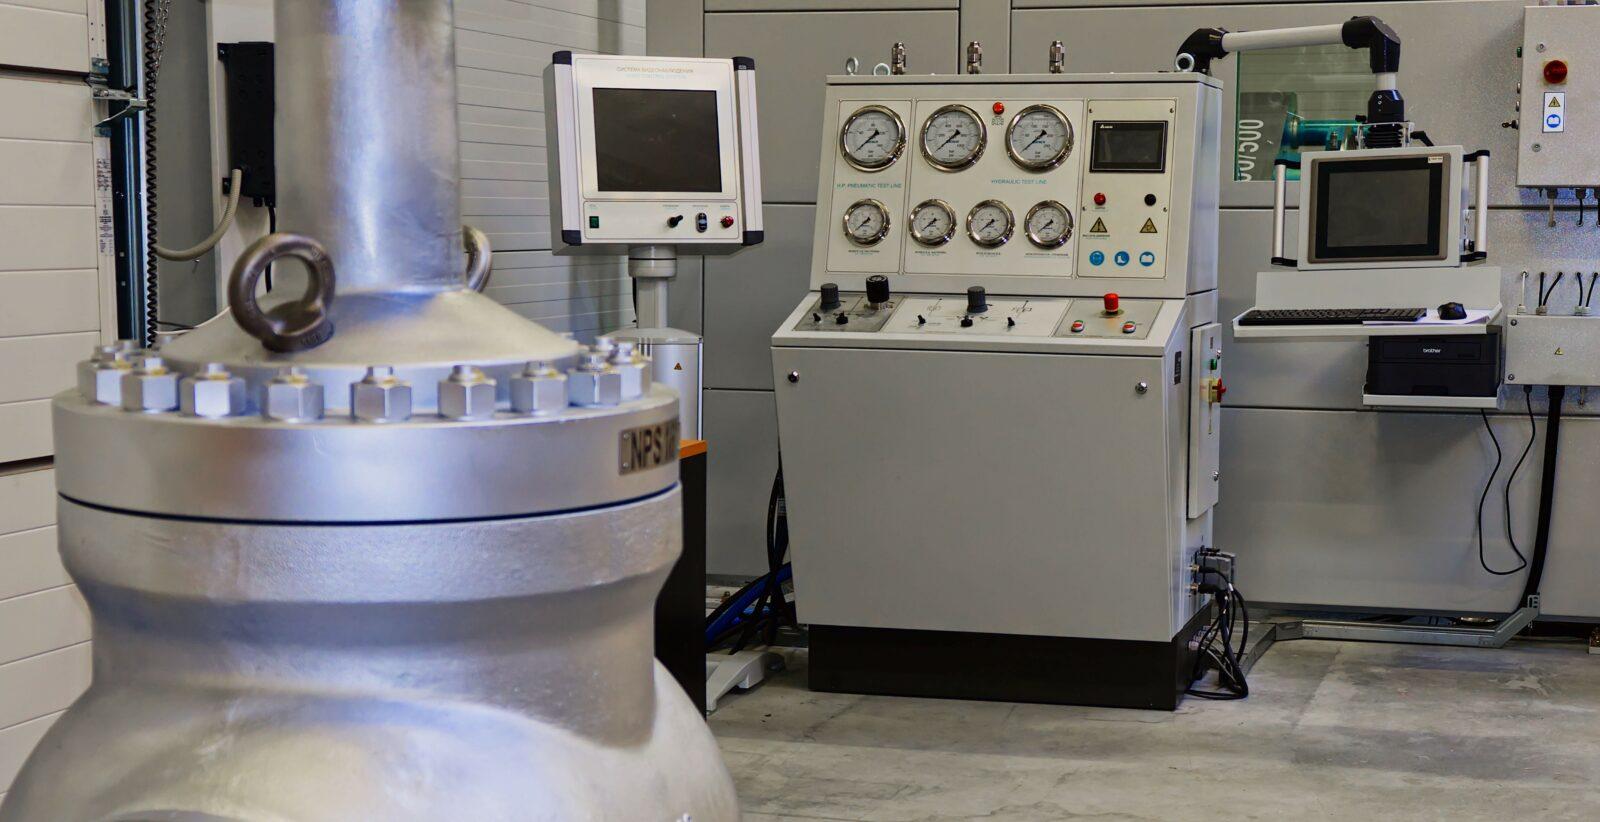 Equipment for pressure test of industrial valves